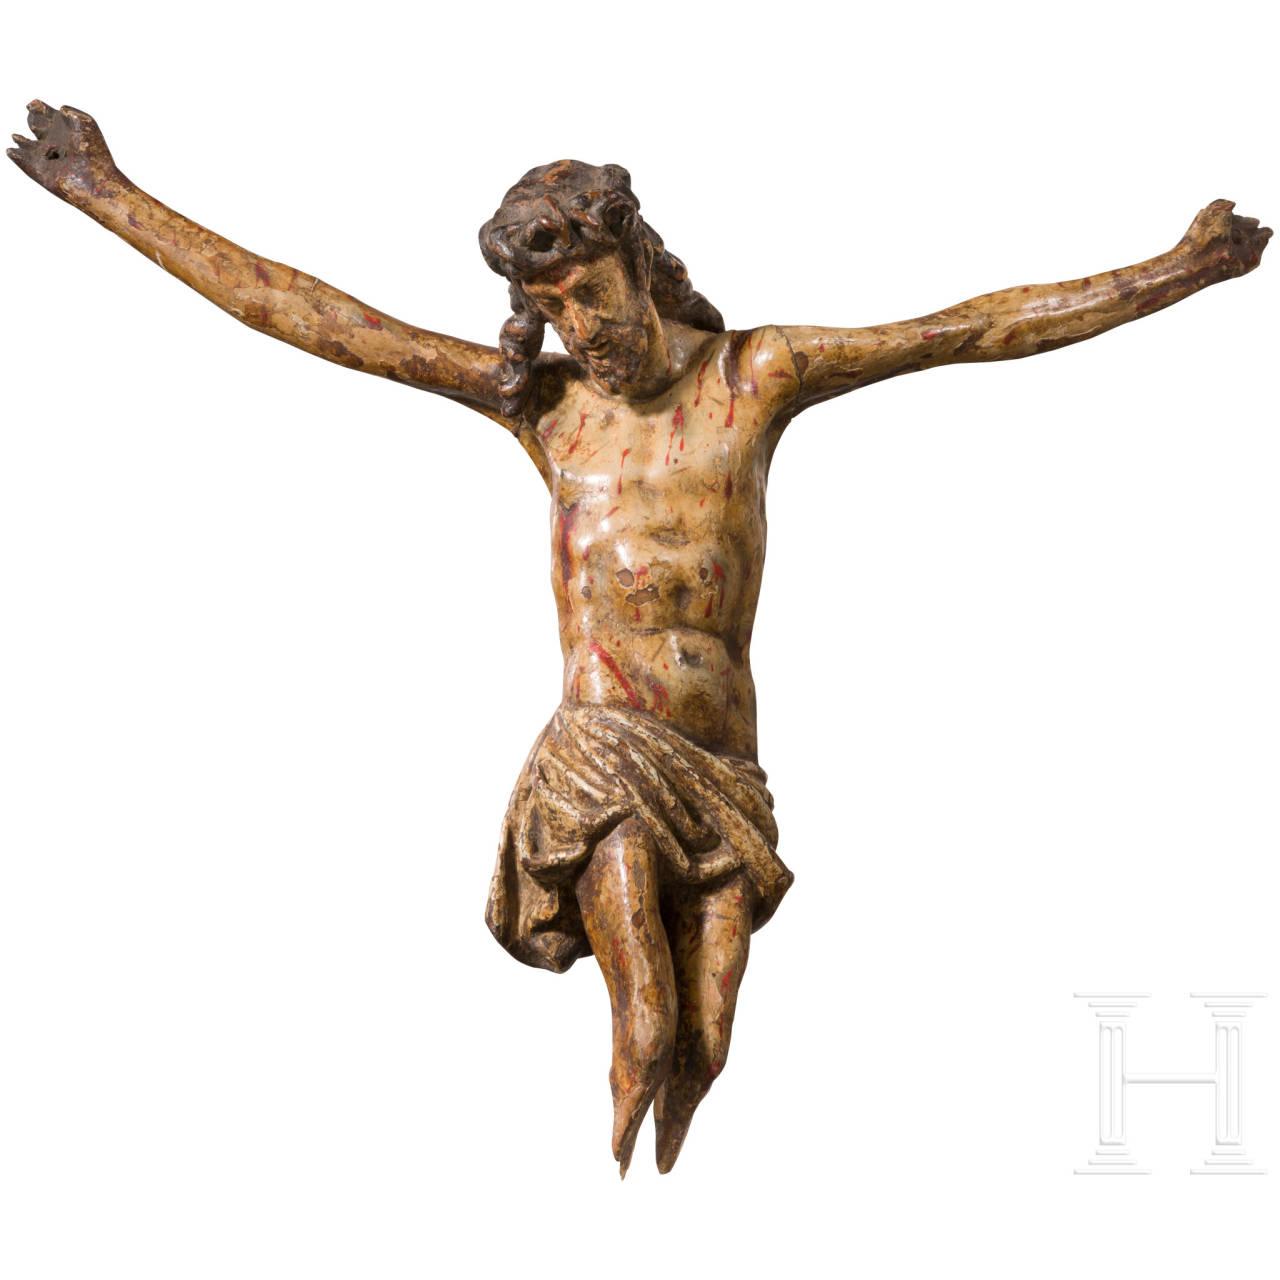 Hölzerner Corpus Christi, Frankreich, 17. Jhdt.